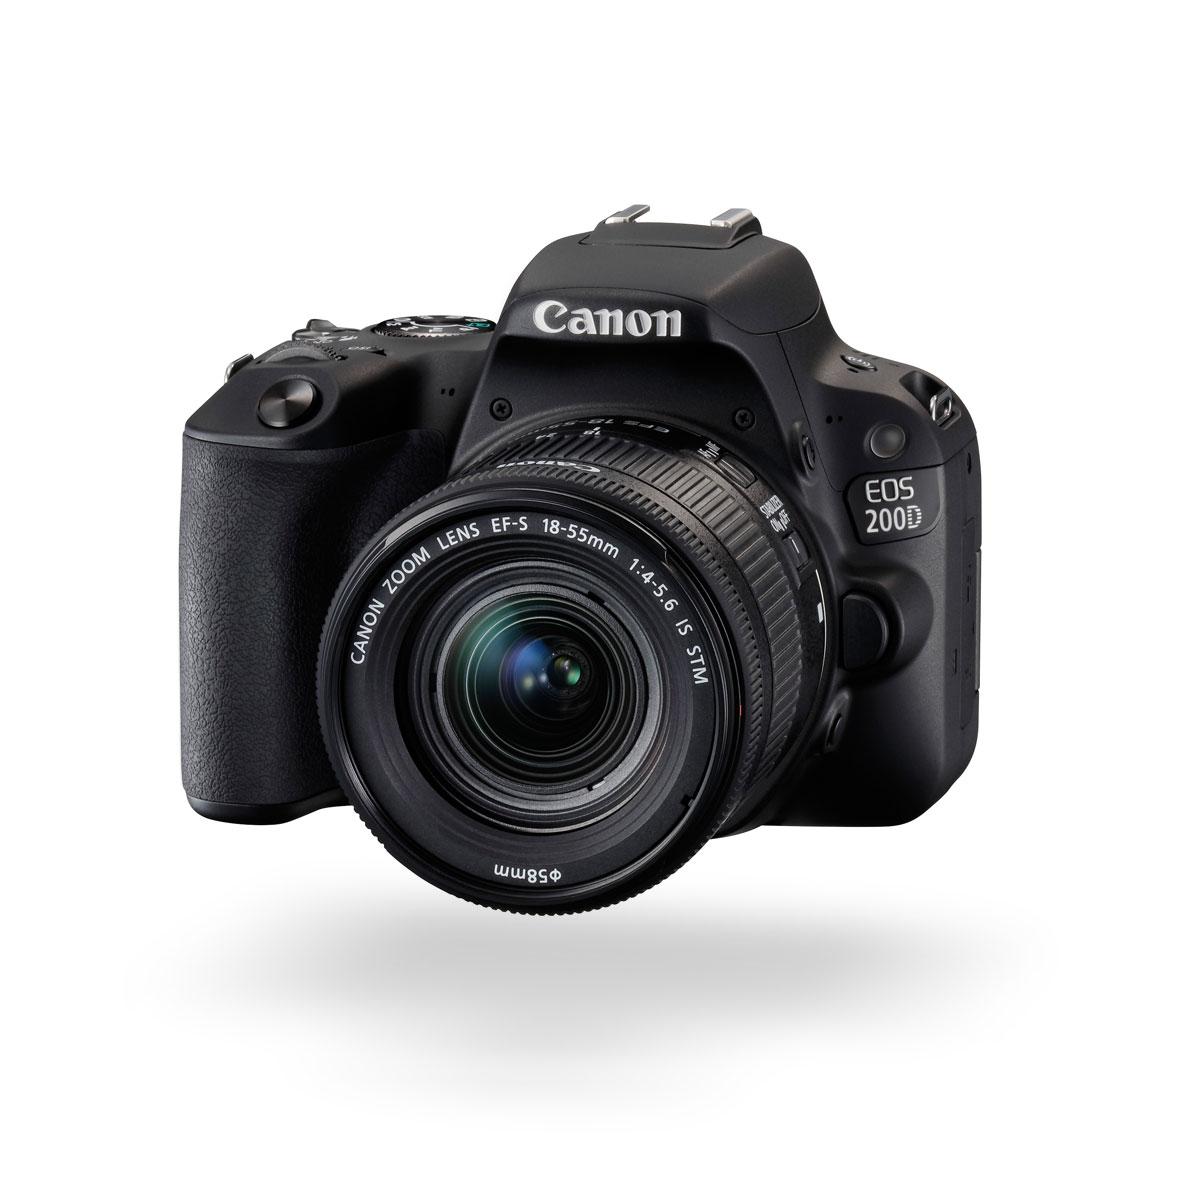 Canon EOS 200D hero image